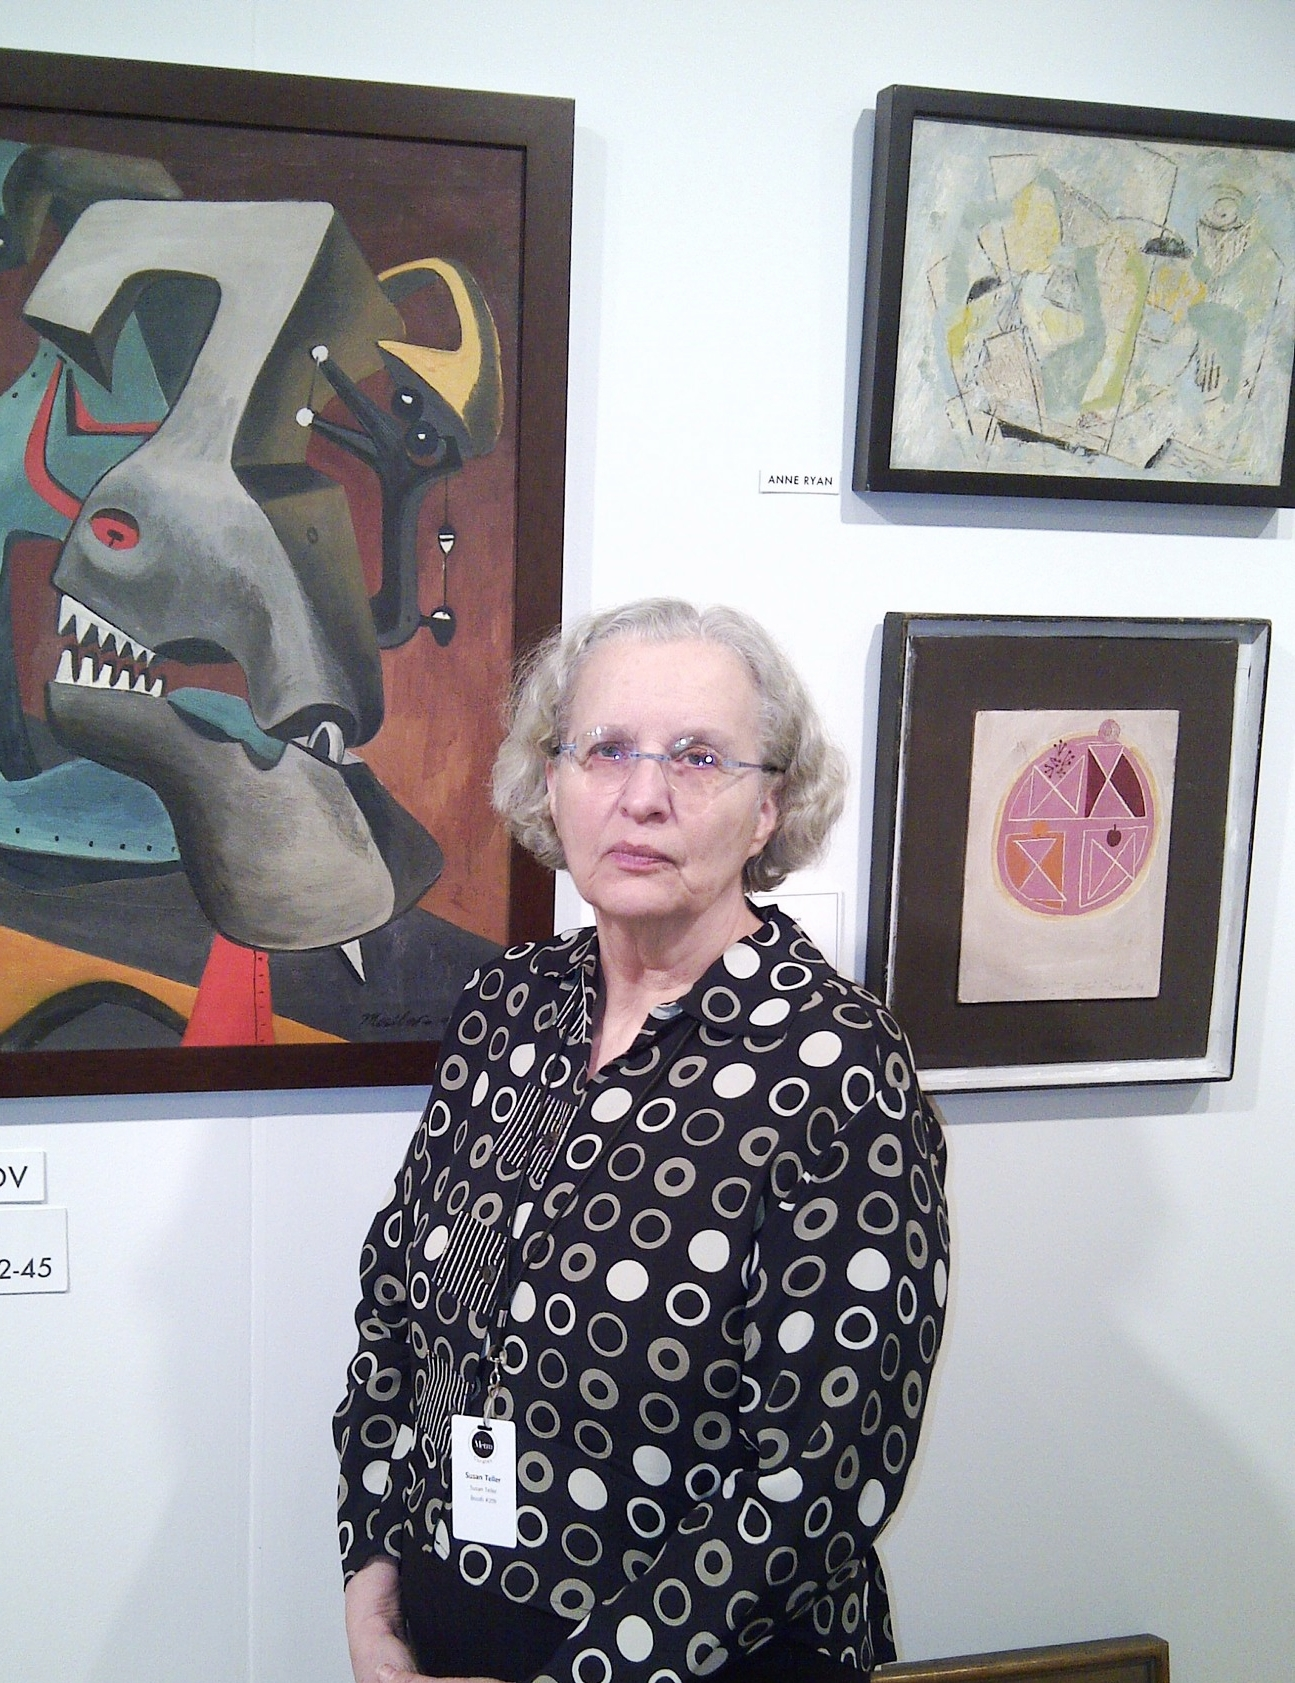 Susan Teller, Director of Susan Teller Gallery